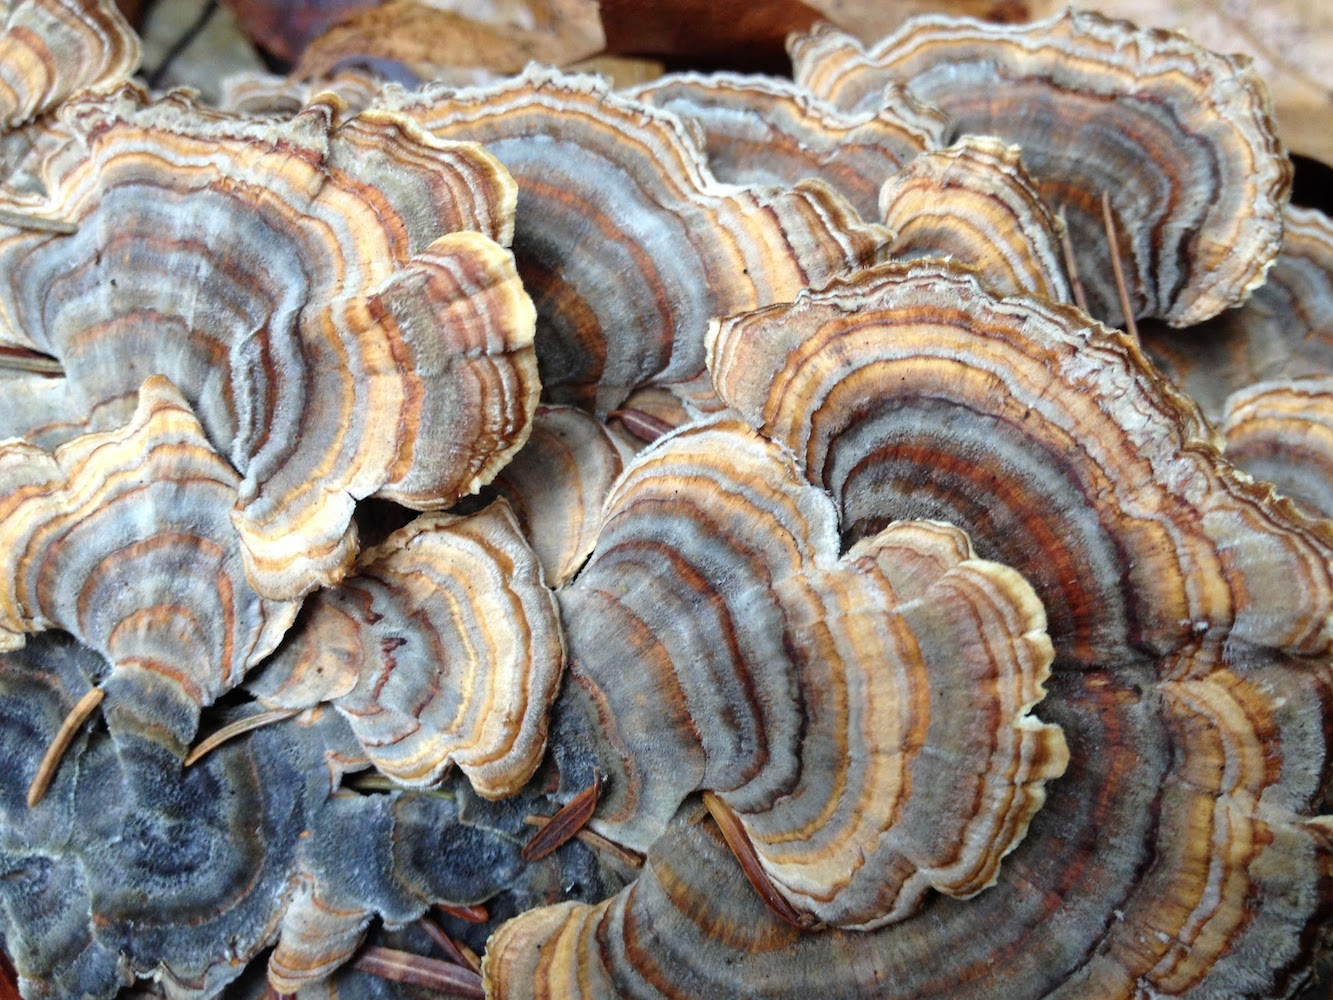 centerpond-mushroom